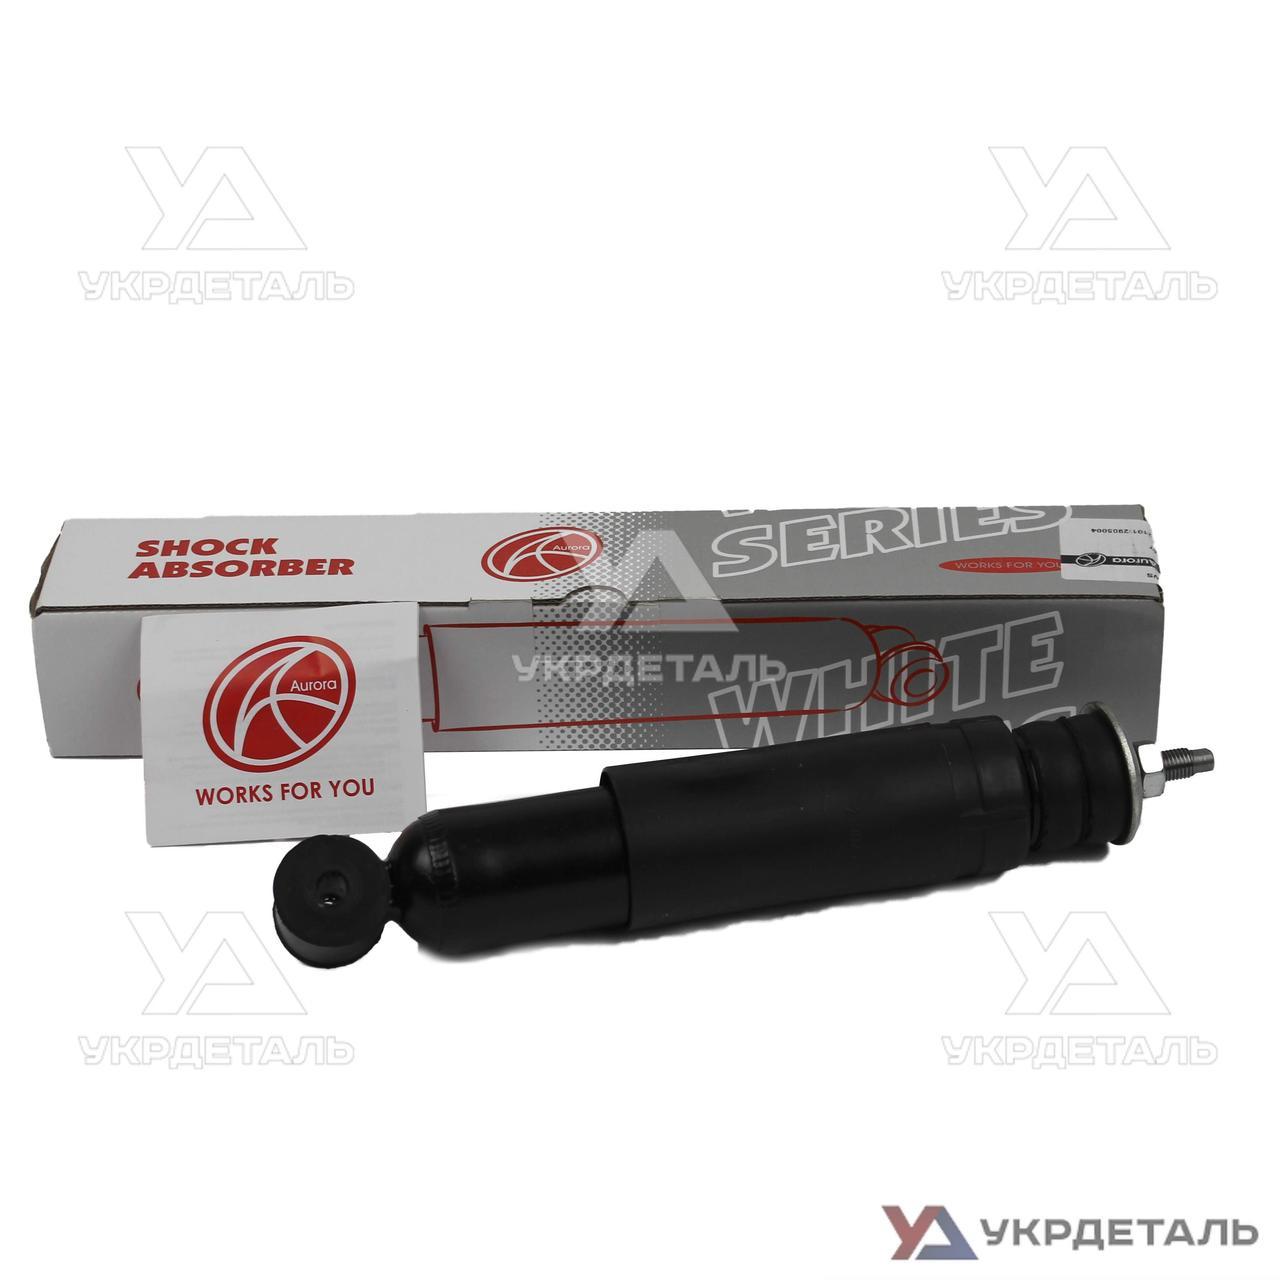 Амортизатор передний ВАЗ-2101, 2102, 2103, 2104, 2105, 2106, 2107 (стойка) White Series | AURORA Польша, фото 1